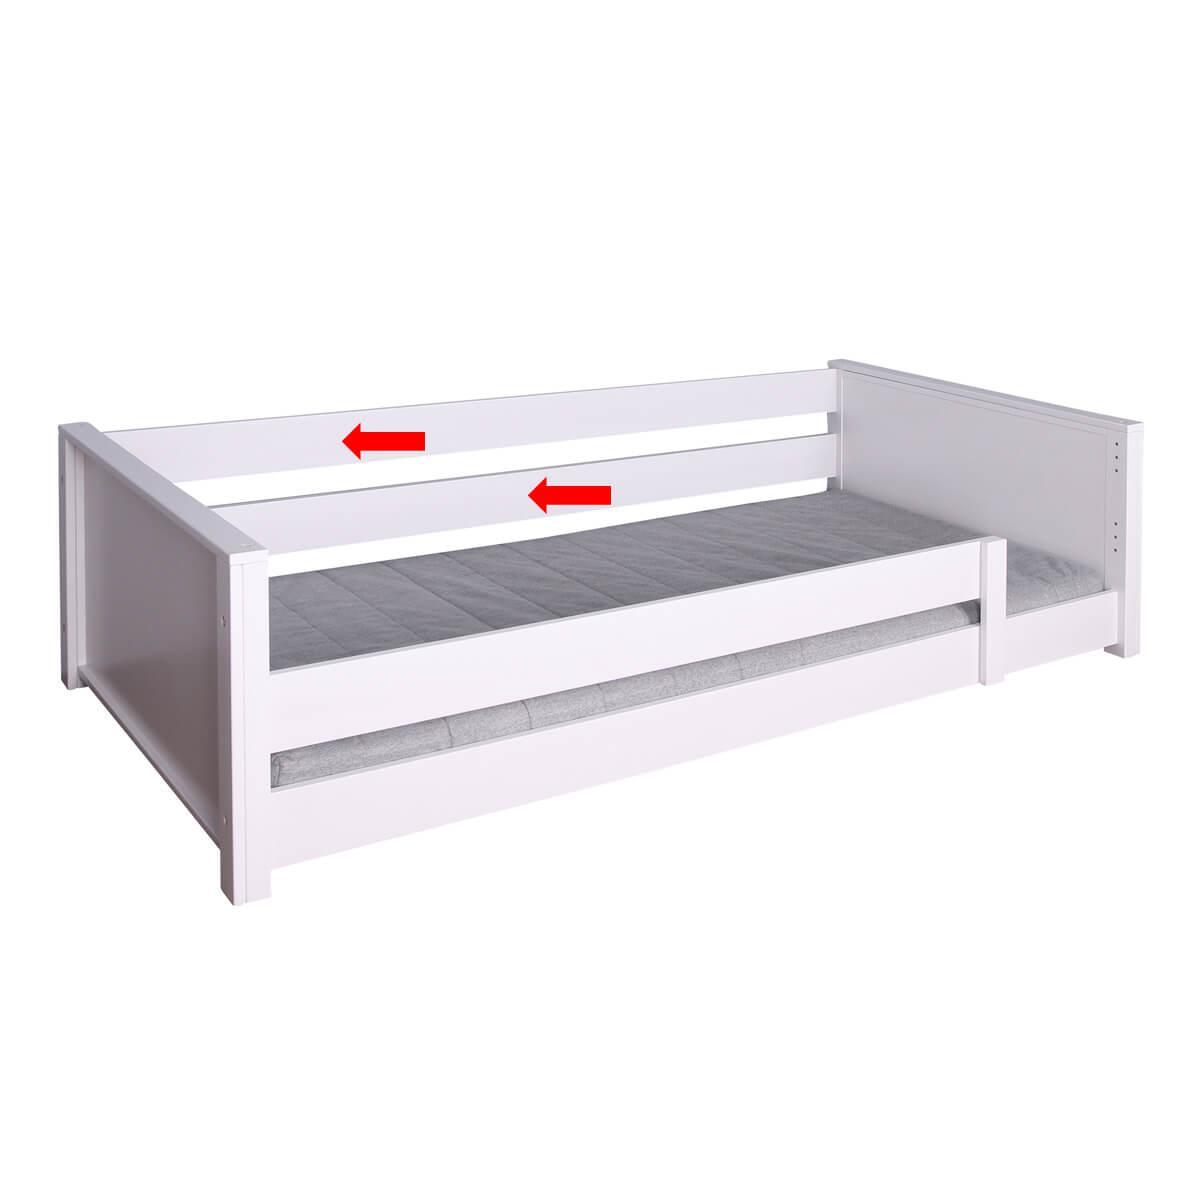 Paket-Rahmenzarge 200 1stk KASVA Debreuyn Buche massiv weiß-lackiert